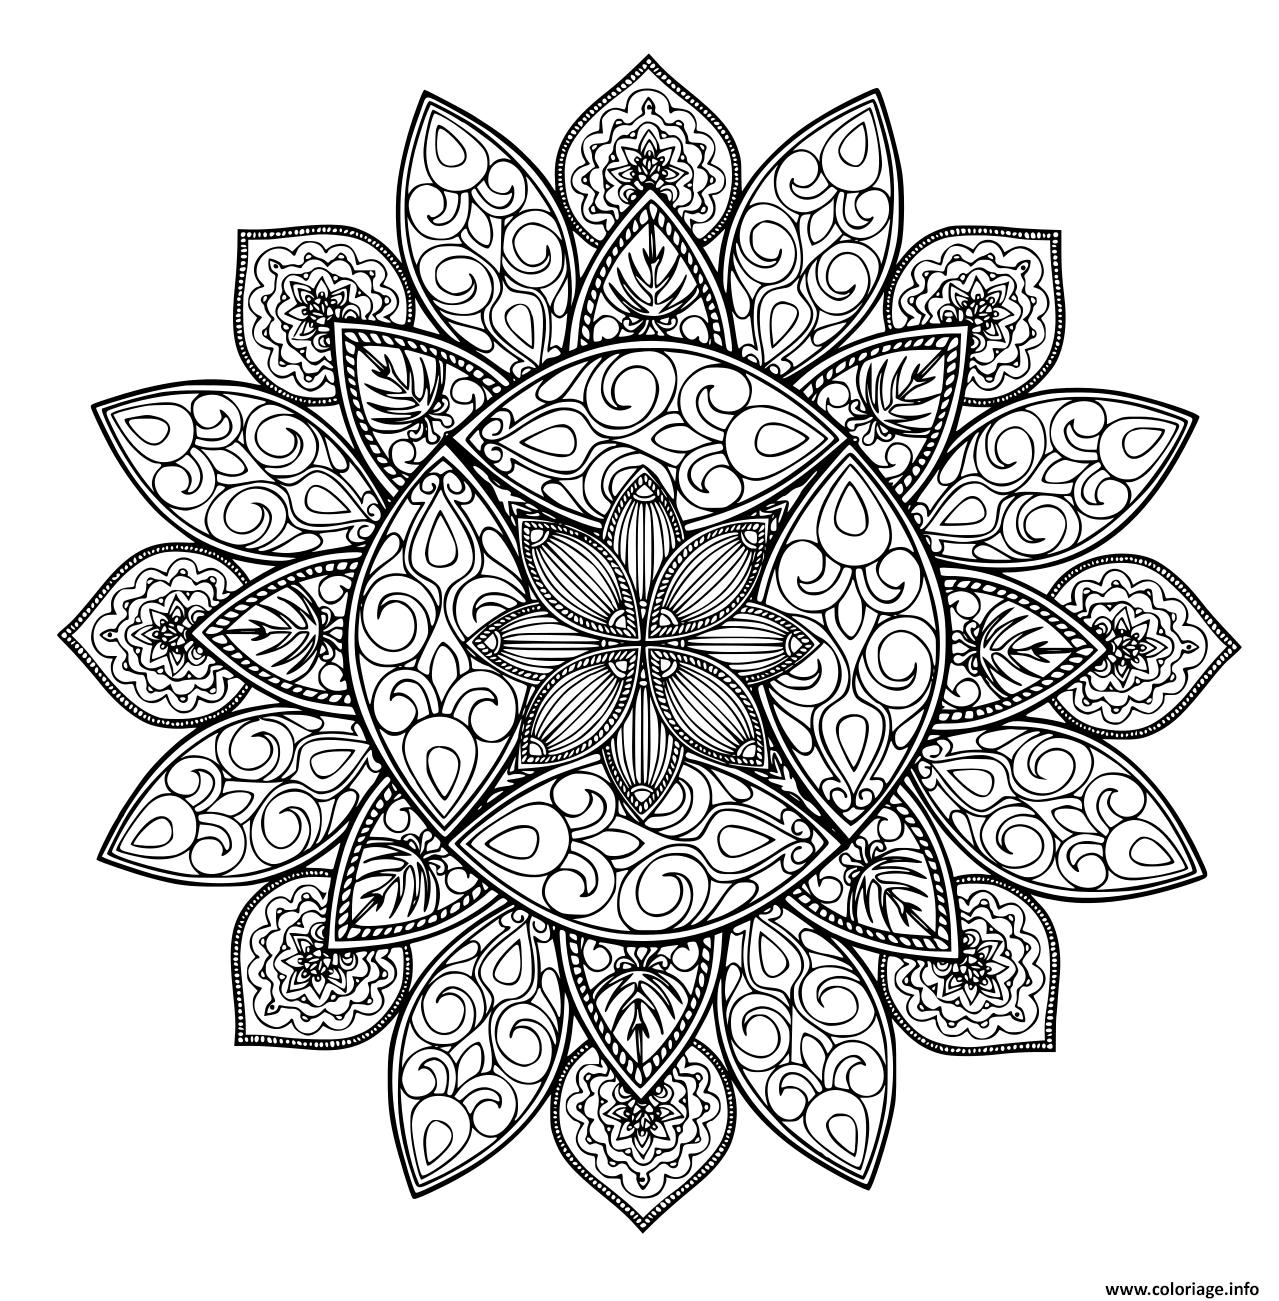 Coloriage Mandala Forme Geometrique dessin